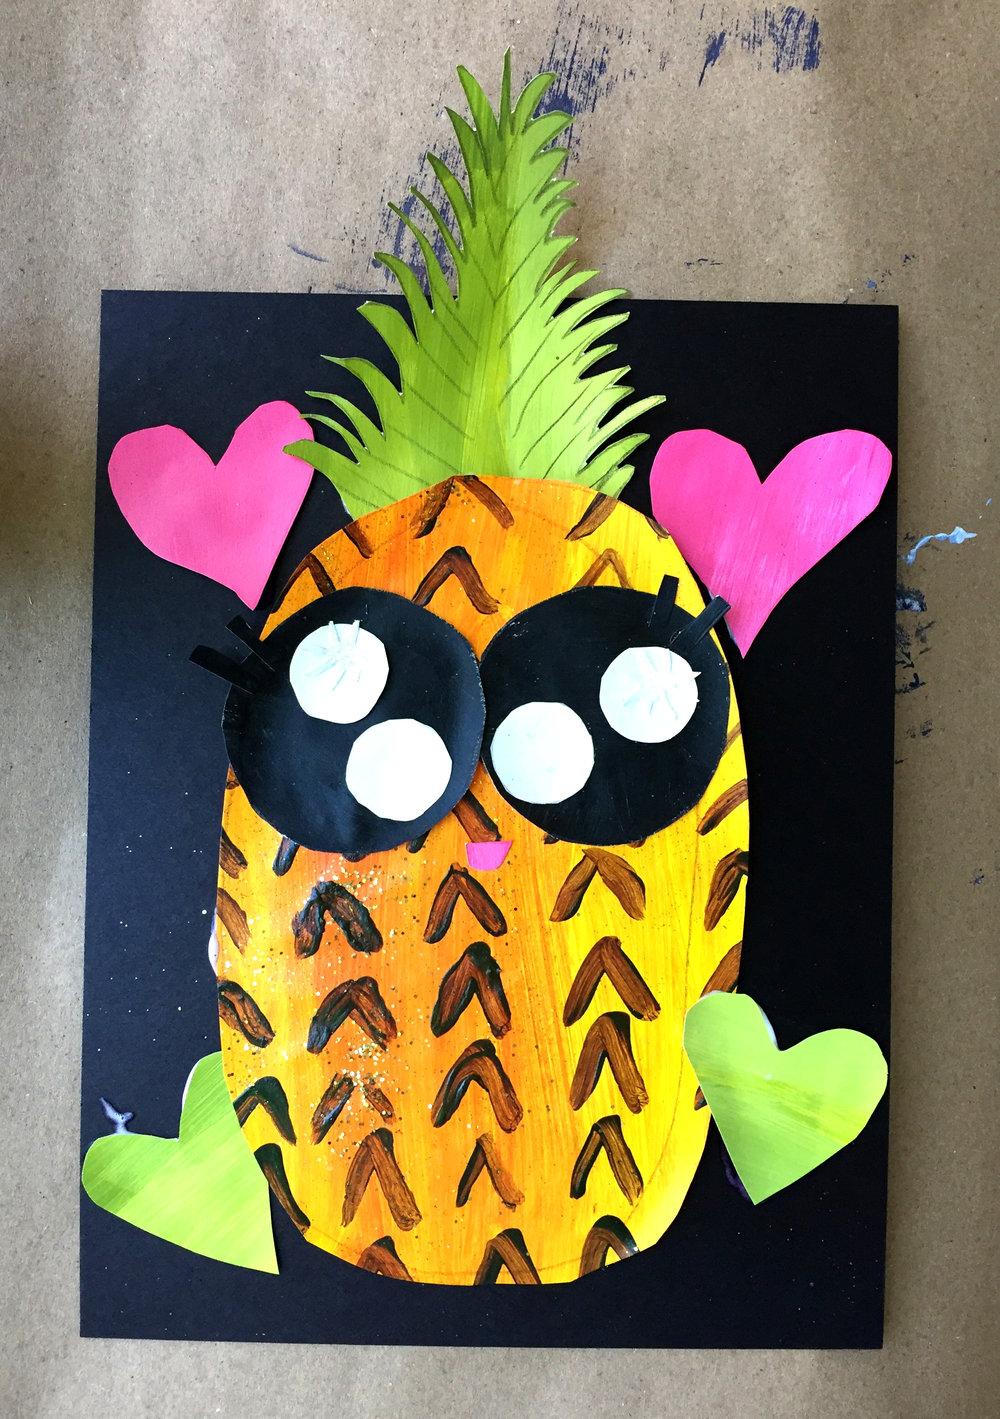 Pineapple Collage.jpg